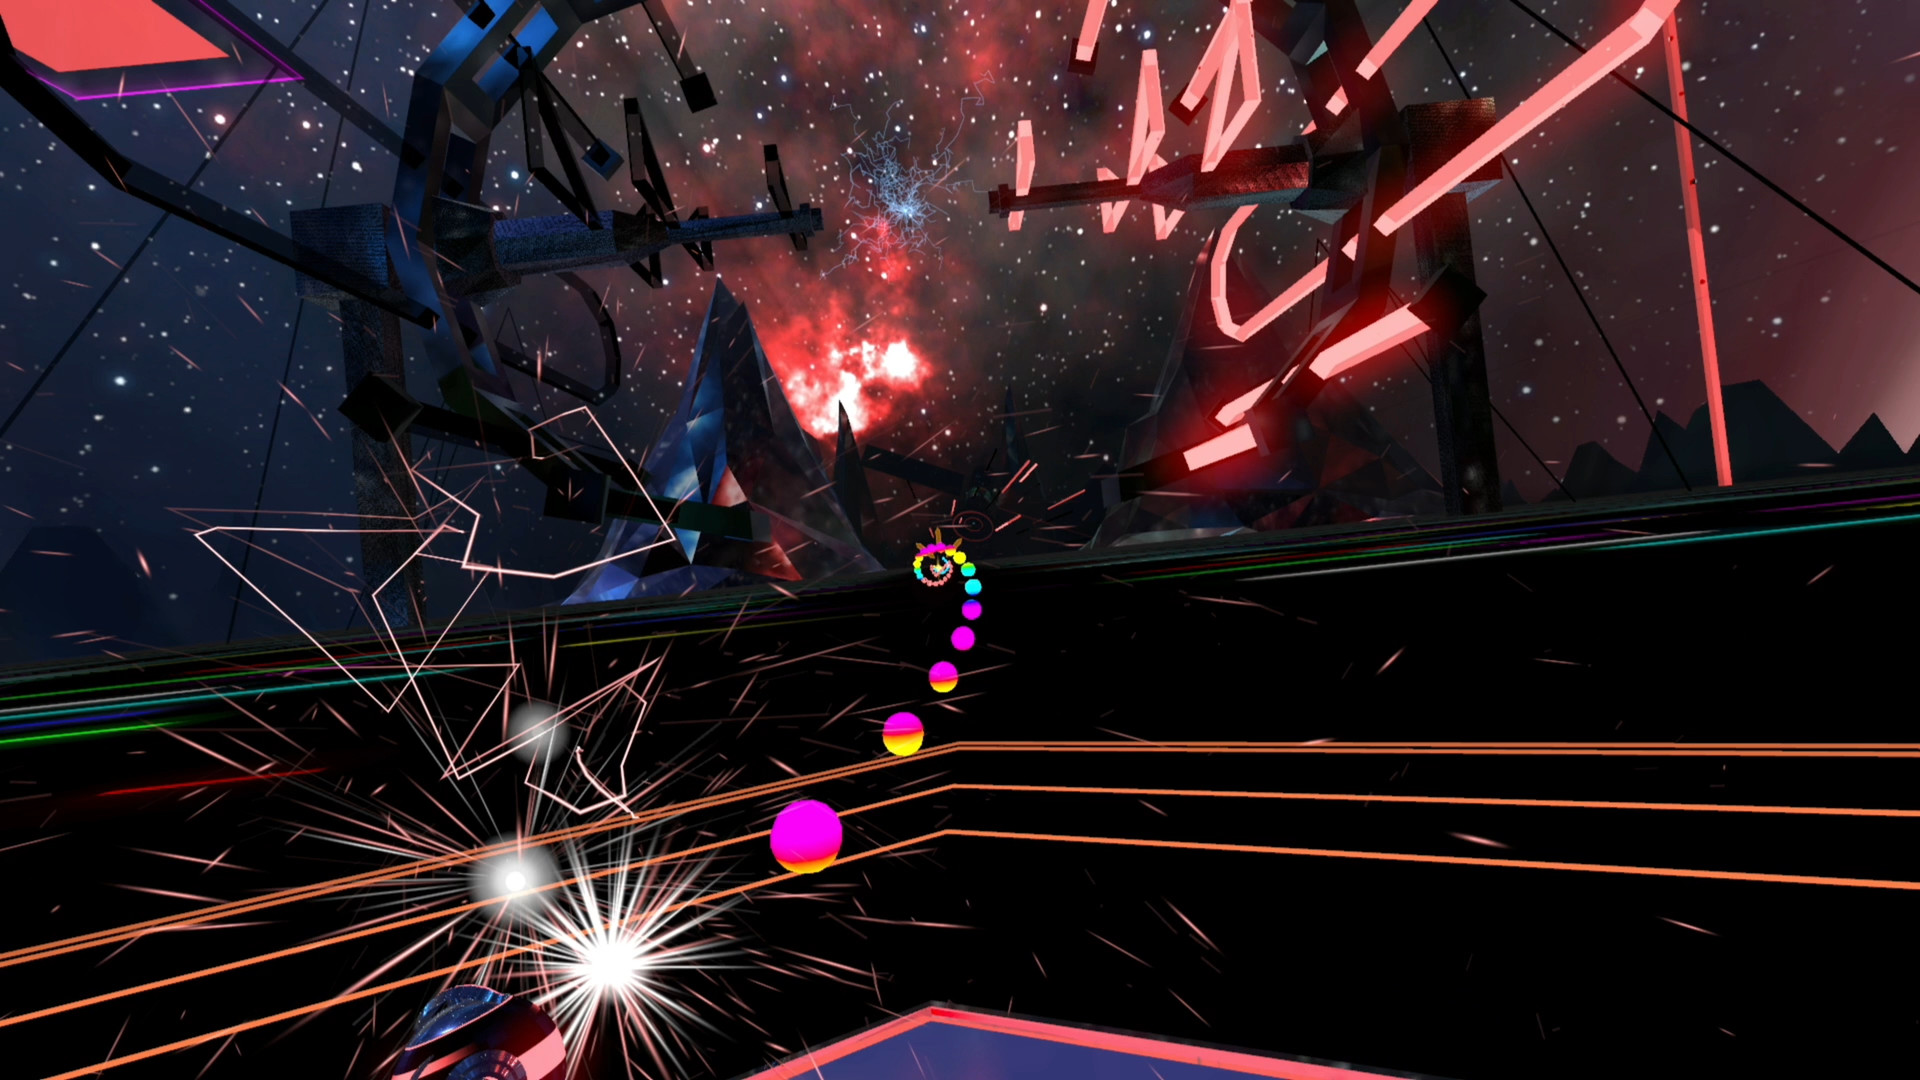 Oculus Quest 游戏《Synth Riders》合成骑士插图